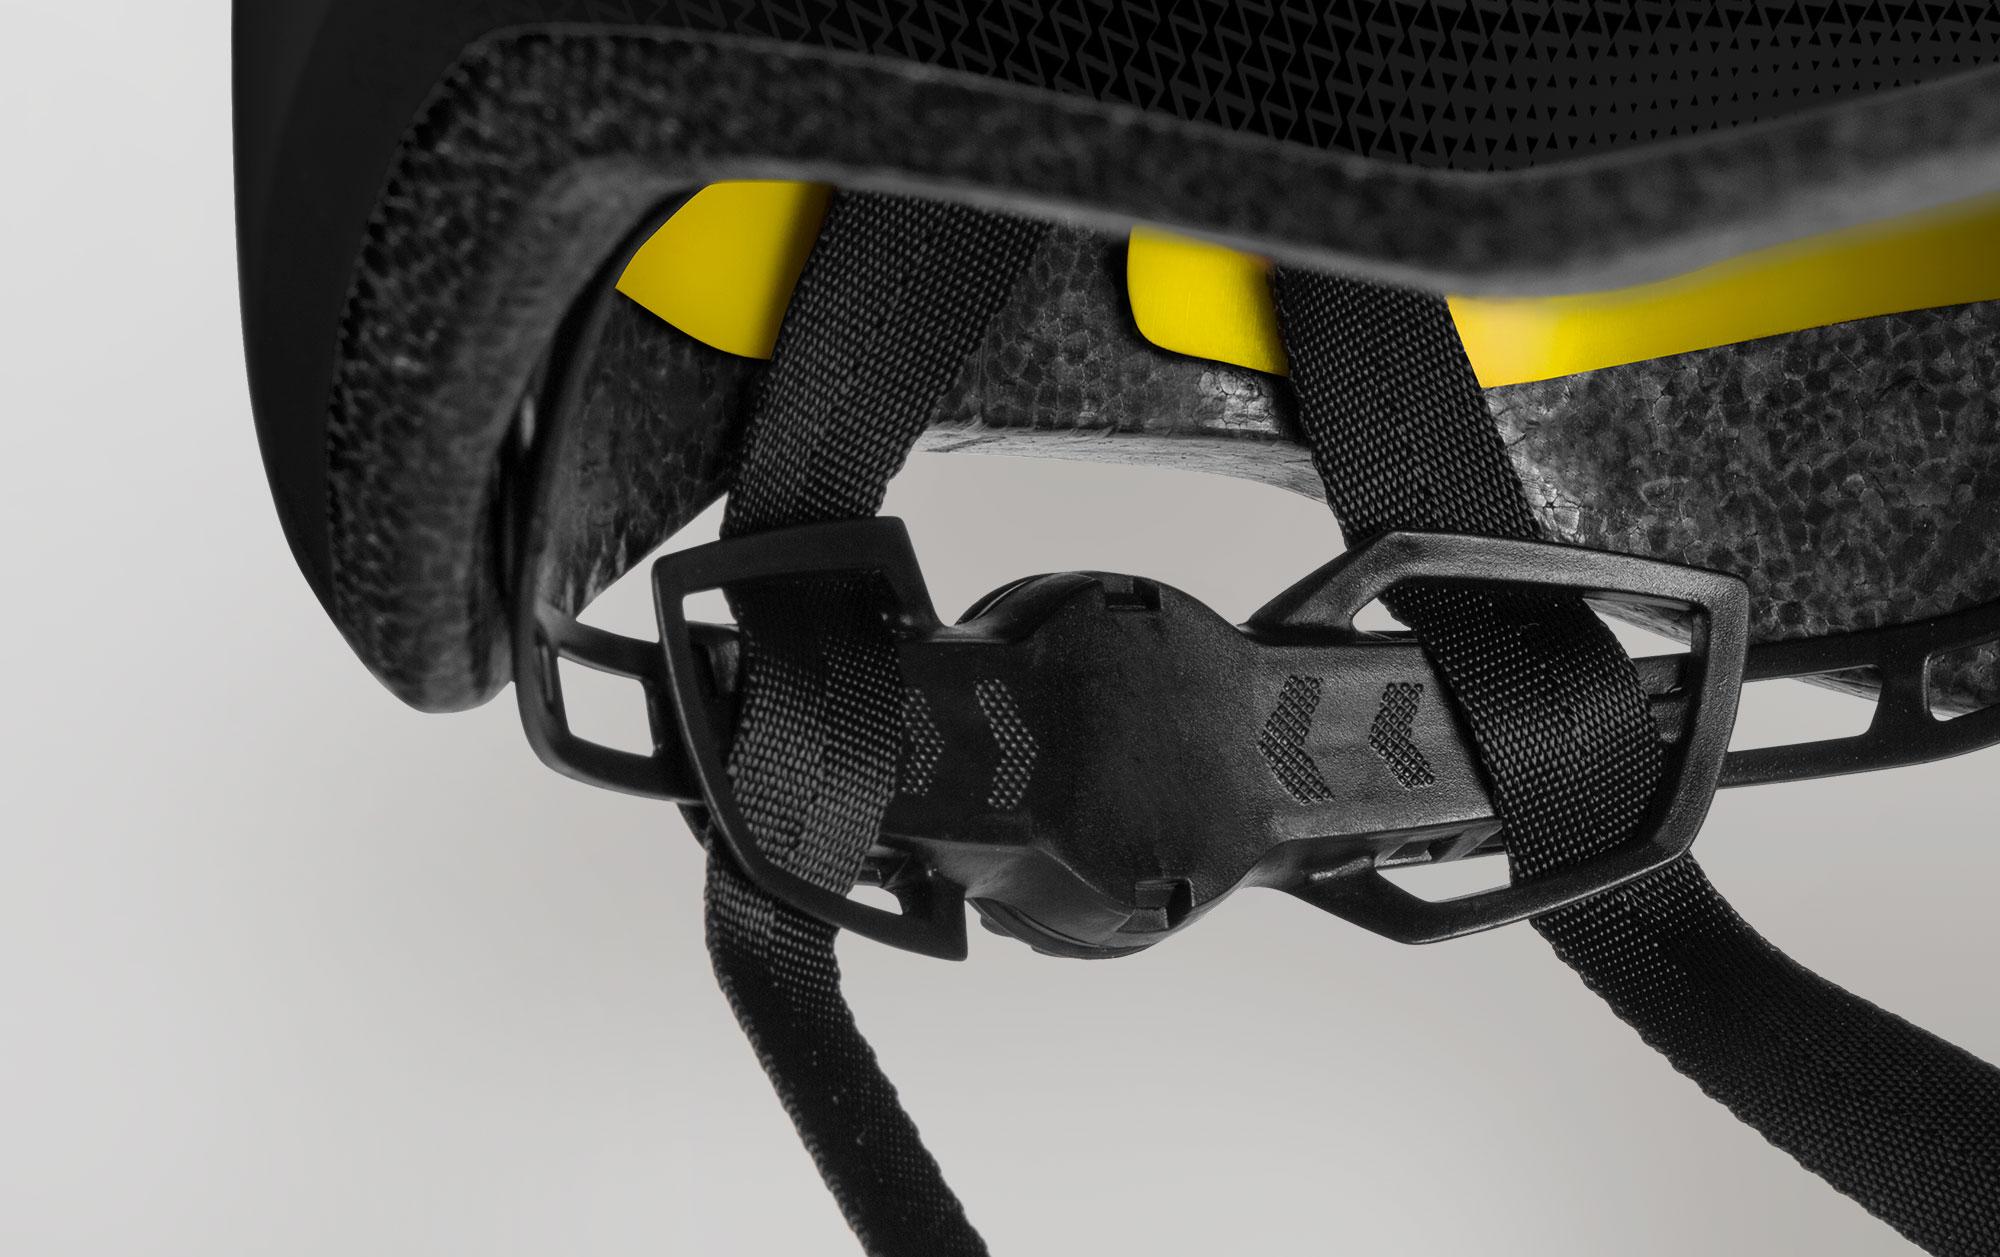 MET Miles Mips Trekking and City Helmet Brain Protection System